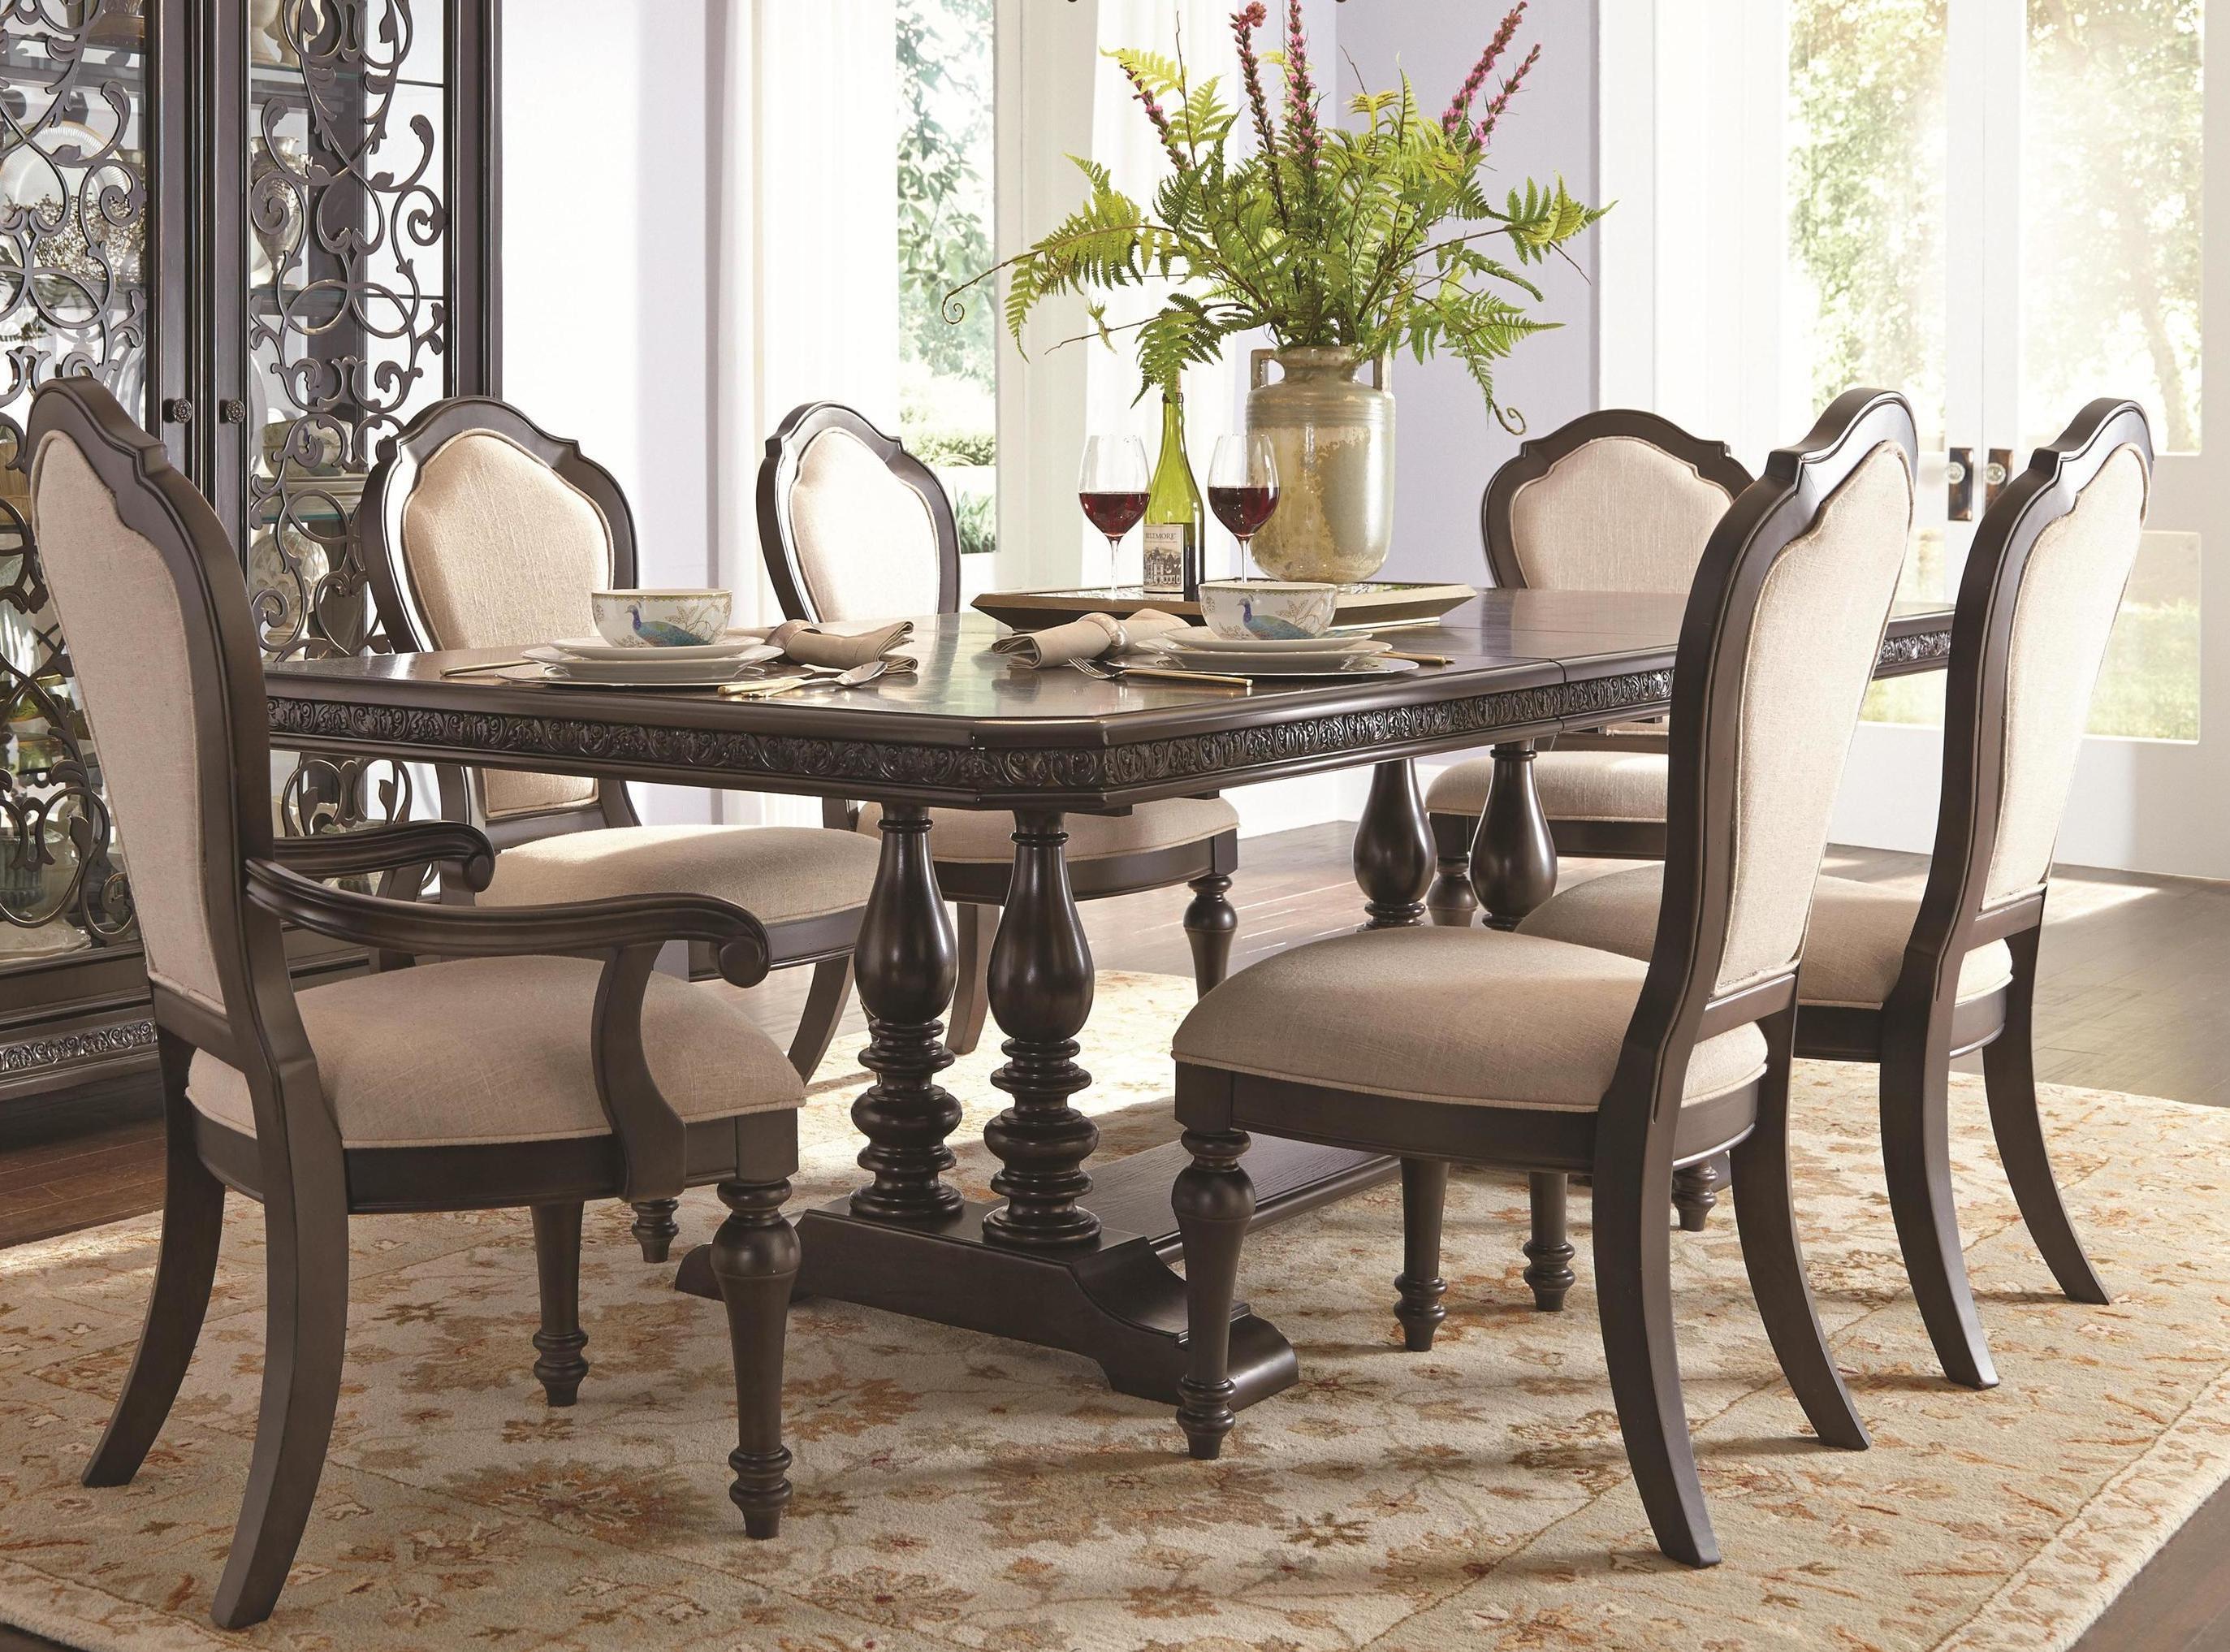 Morris Home Furnishings Monaco Monaco 5-Piece Dining Set - Item Number: 358228623